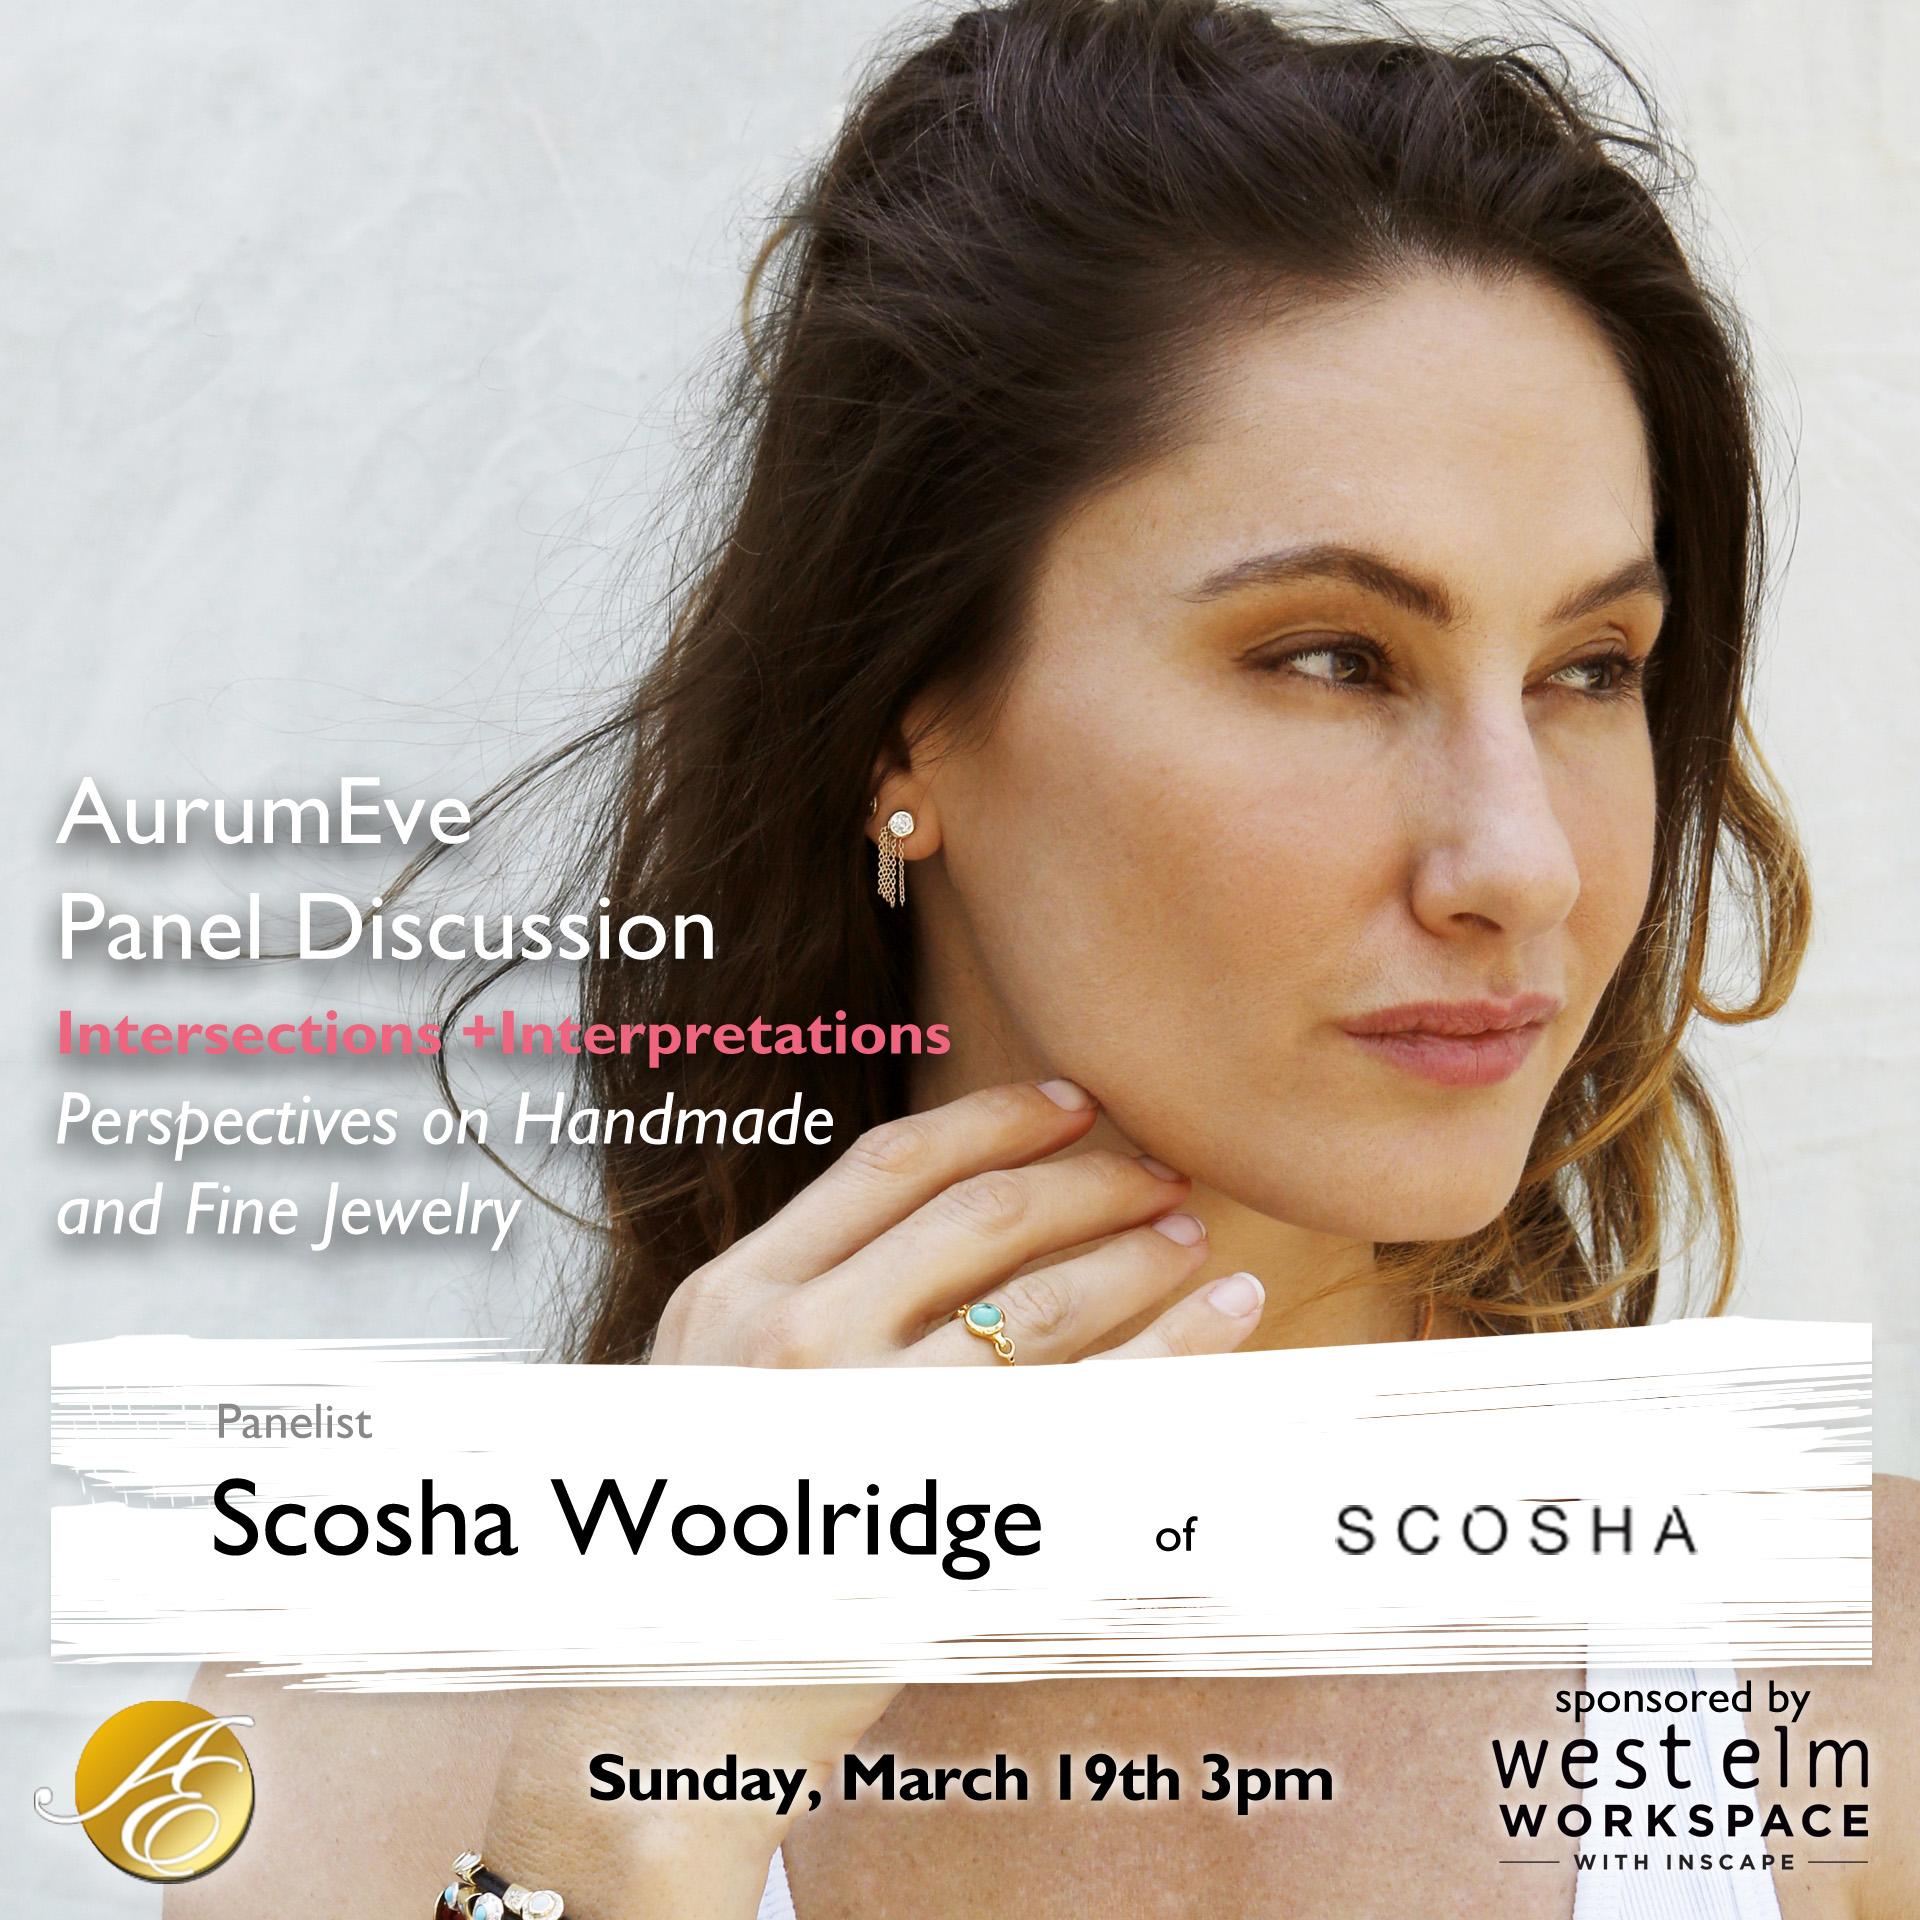 Scosha Woolridge Eventbrite